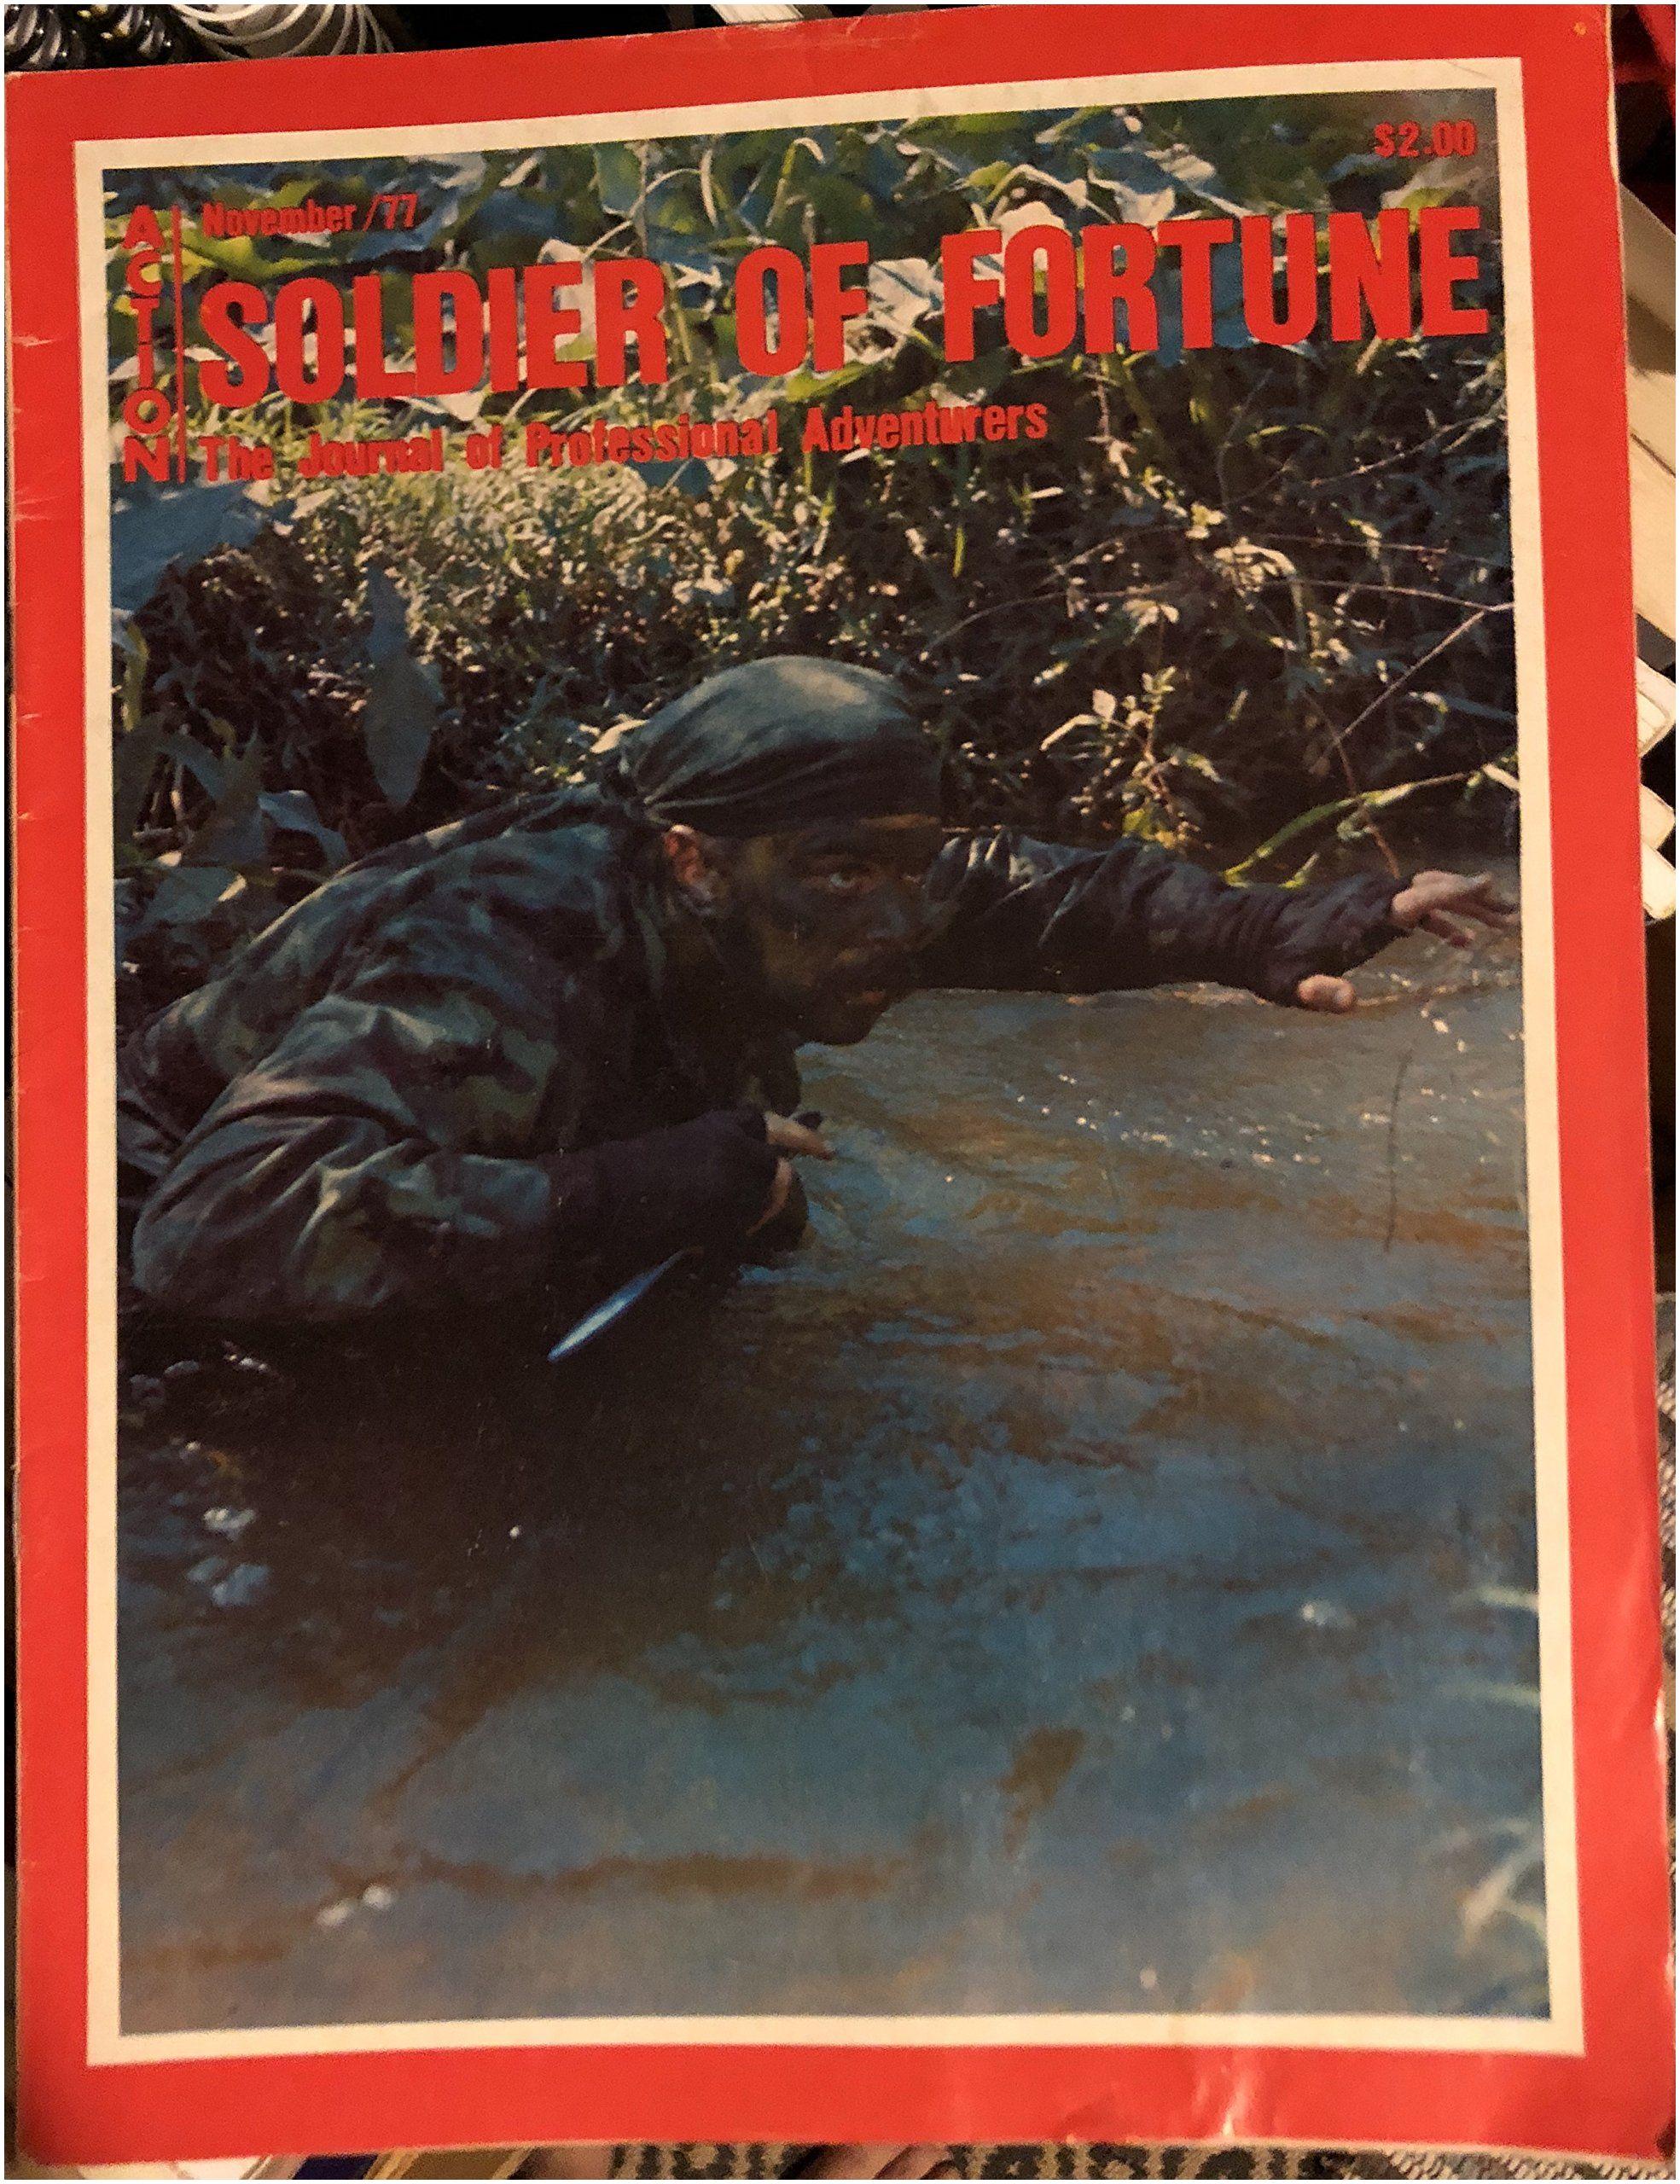 Fortune Magazine Subscription sol R Of fortune Magazine November 1977 Robert K Brown Amazon